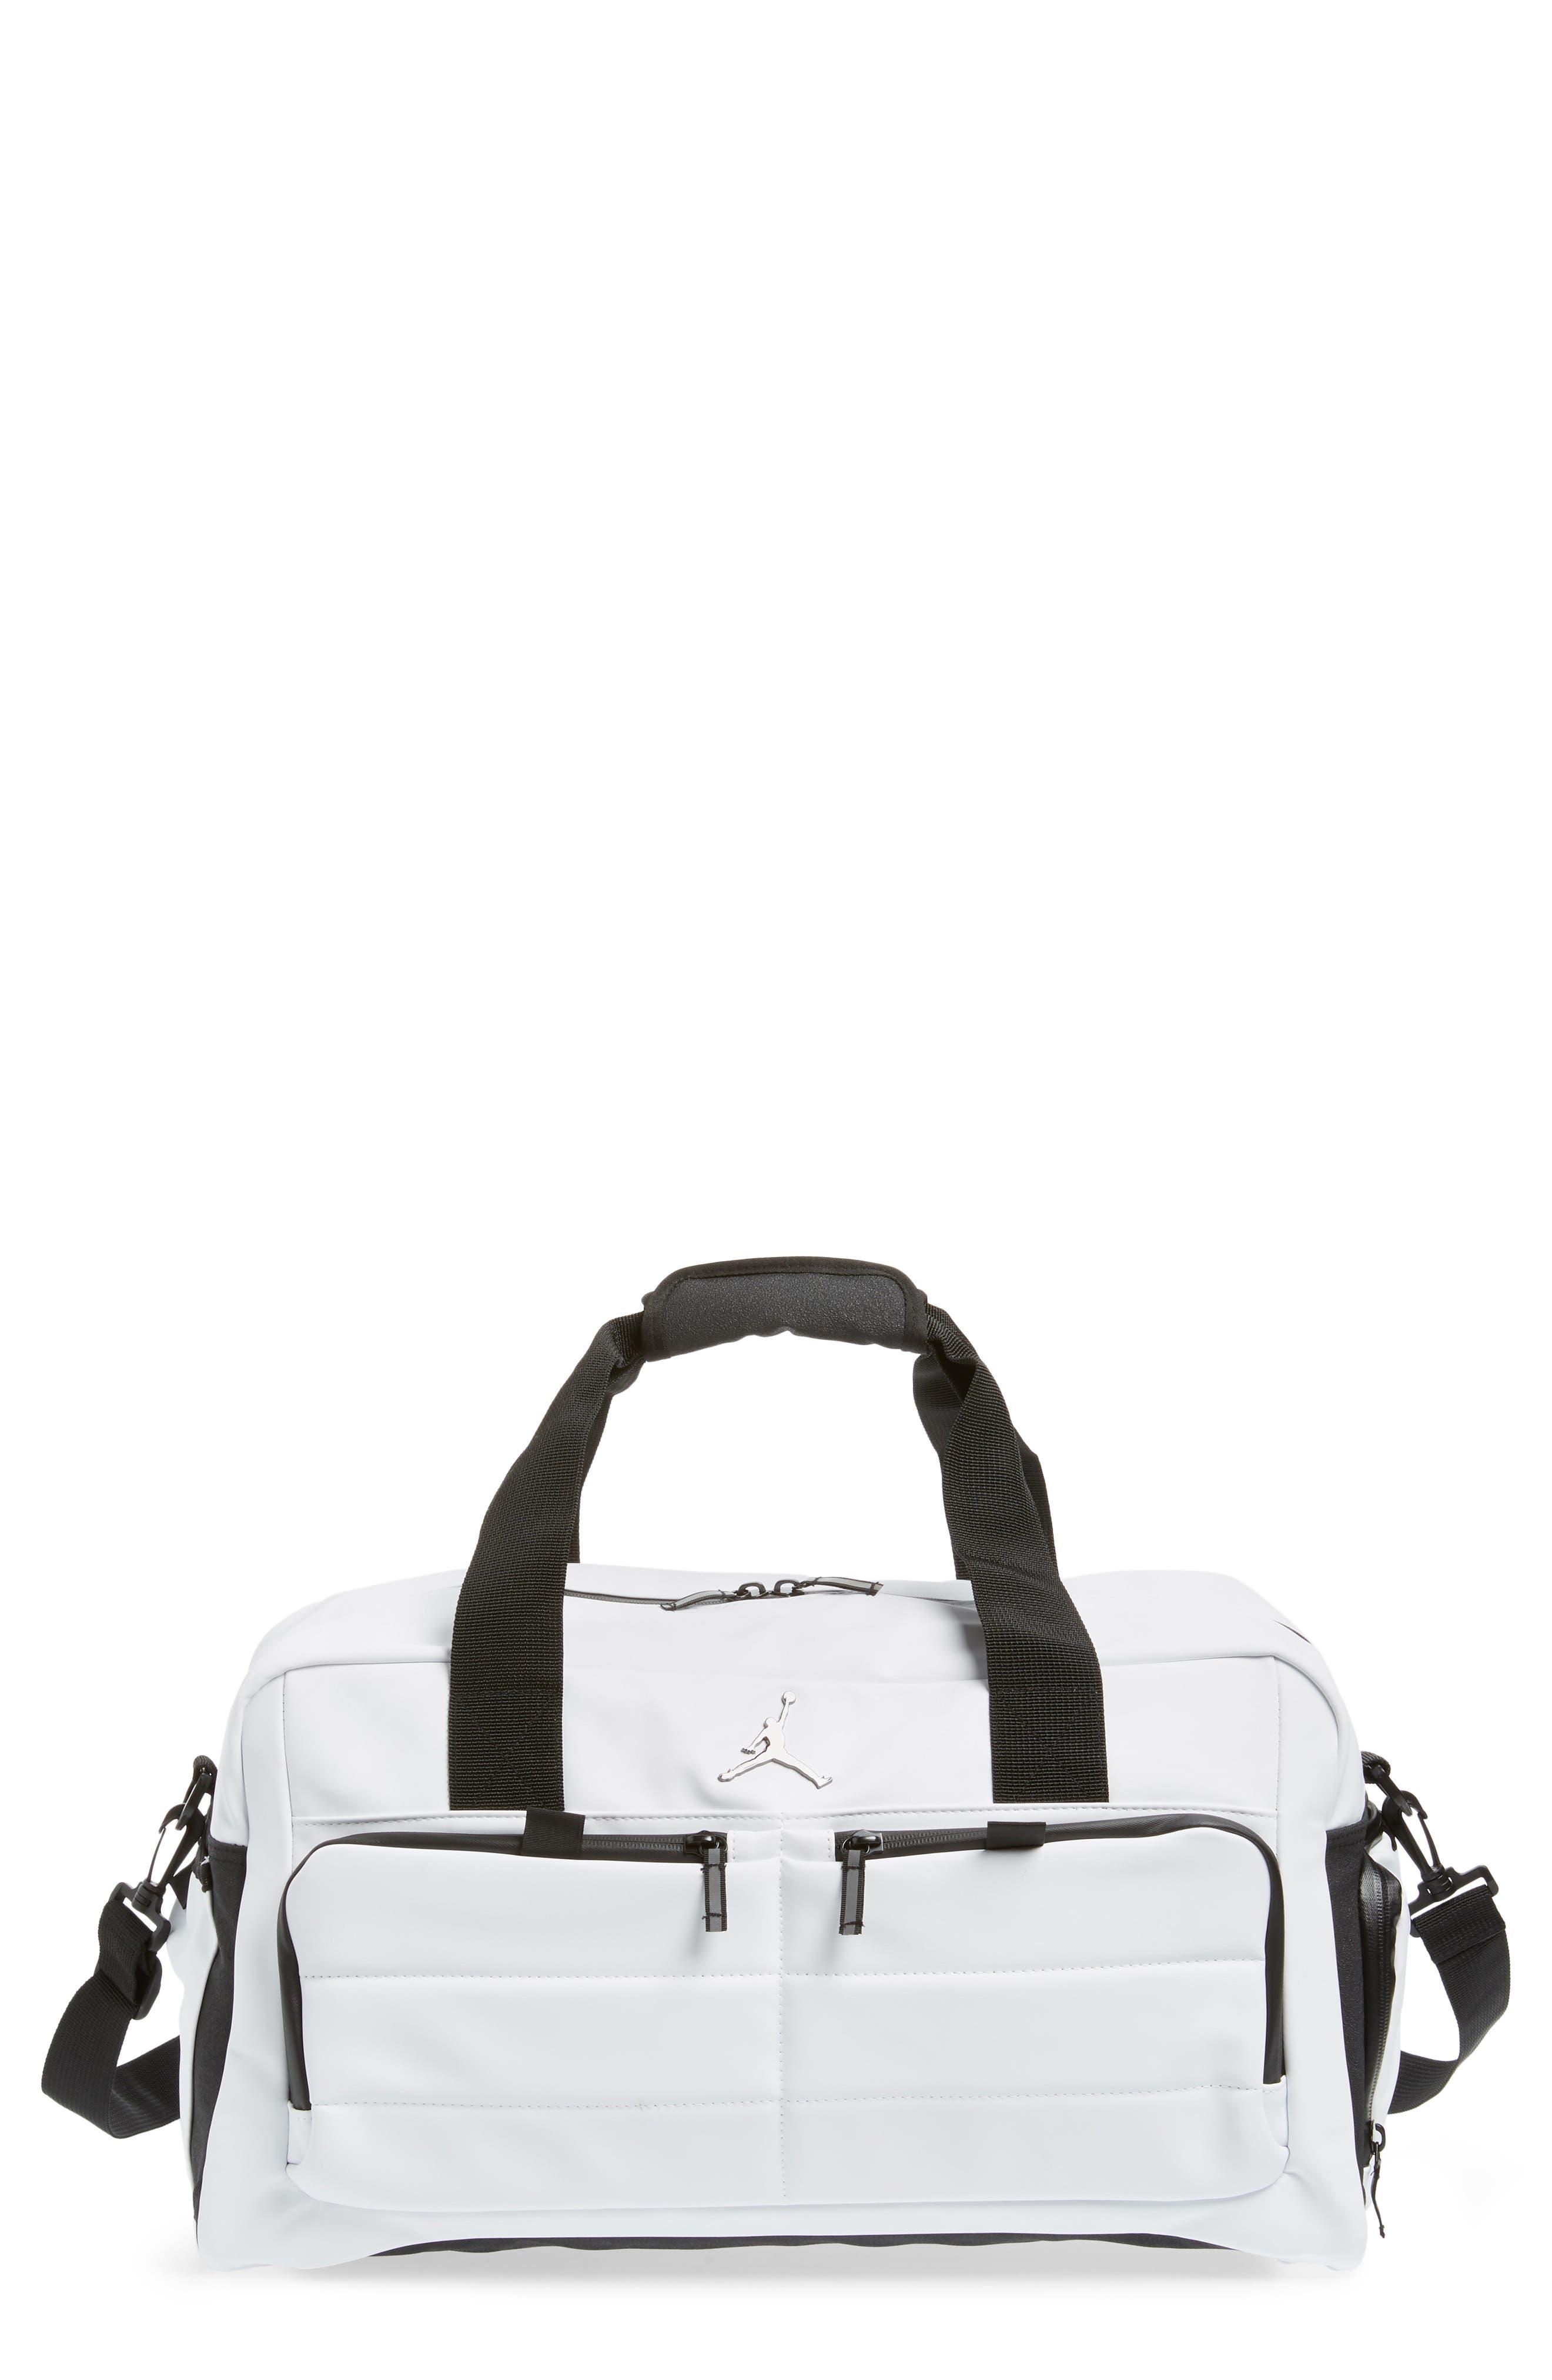 Jordan All World Edition Duffel Bag,                         Main,                         color, WHITE